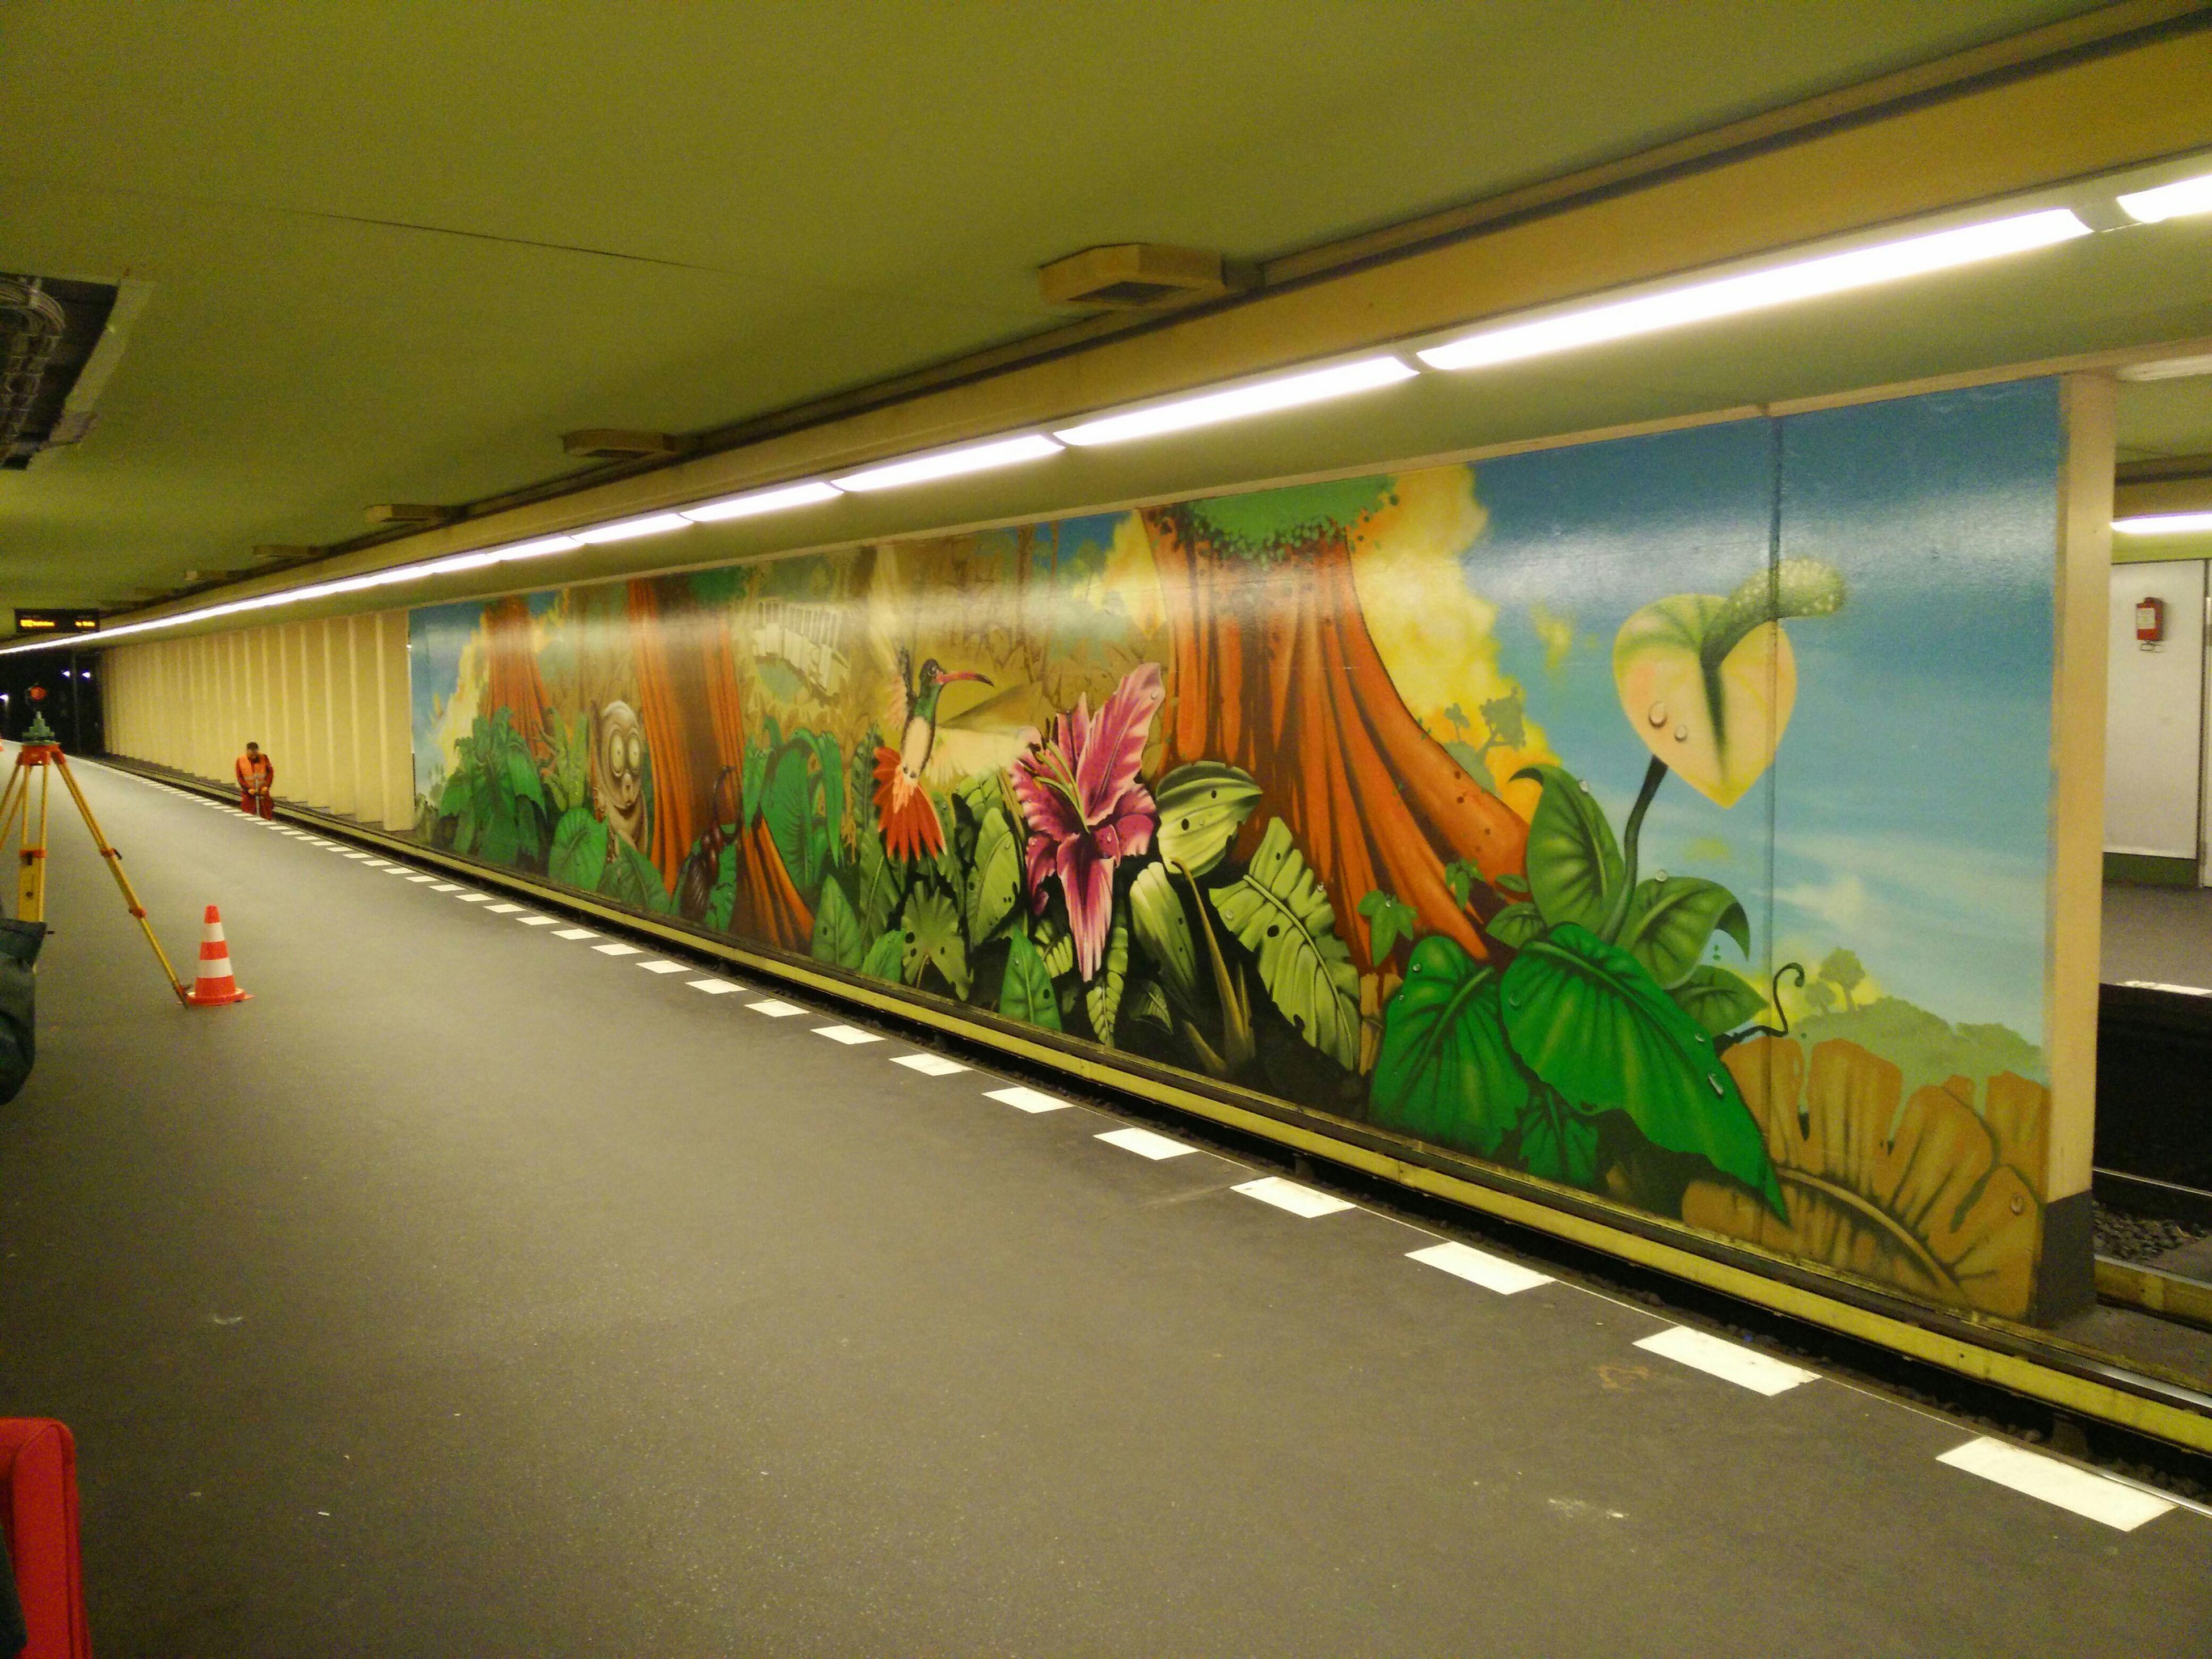 U~Bahn Subway Public Transportation Commuting Metro Station Wall Art Wallpainting